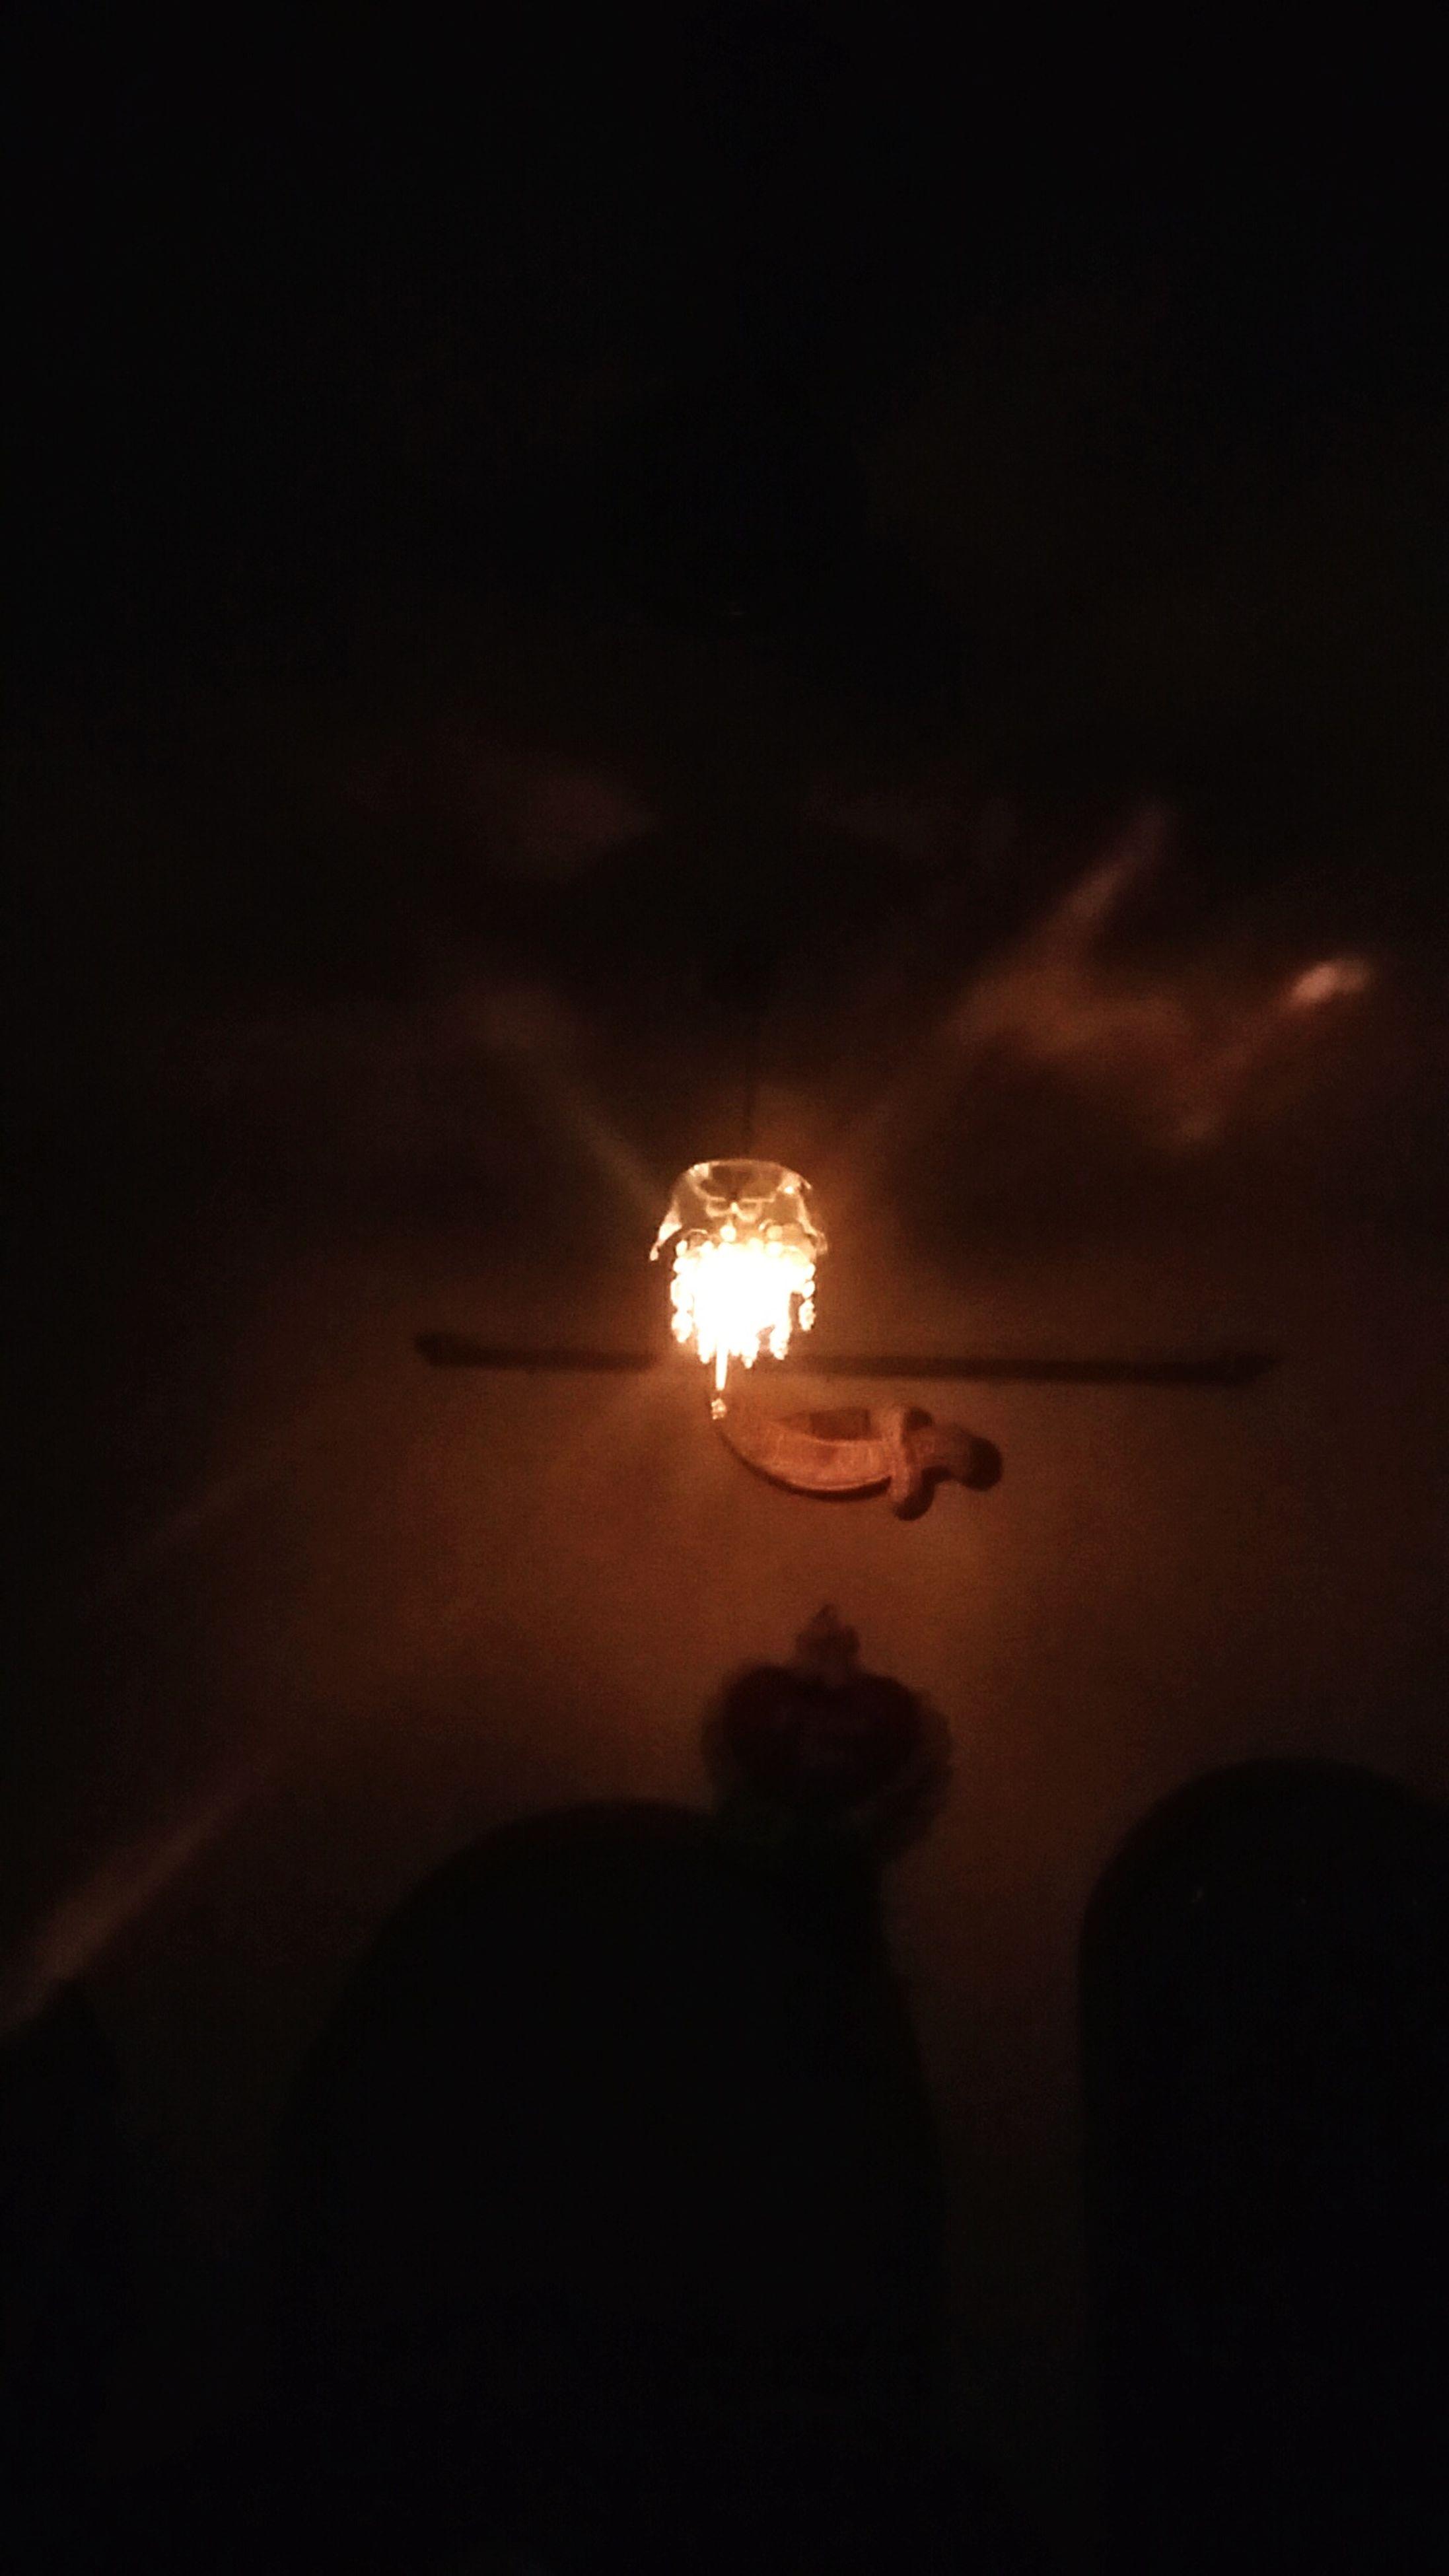 illuminated, lighting equipment, night, electricity, low angle view, glowing, dark, electric light, light - natural phenomenon, street light, copy space, lit, electric lamp, indoors, light bulb, sky, light, hanging, lamp, lantern